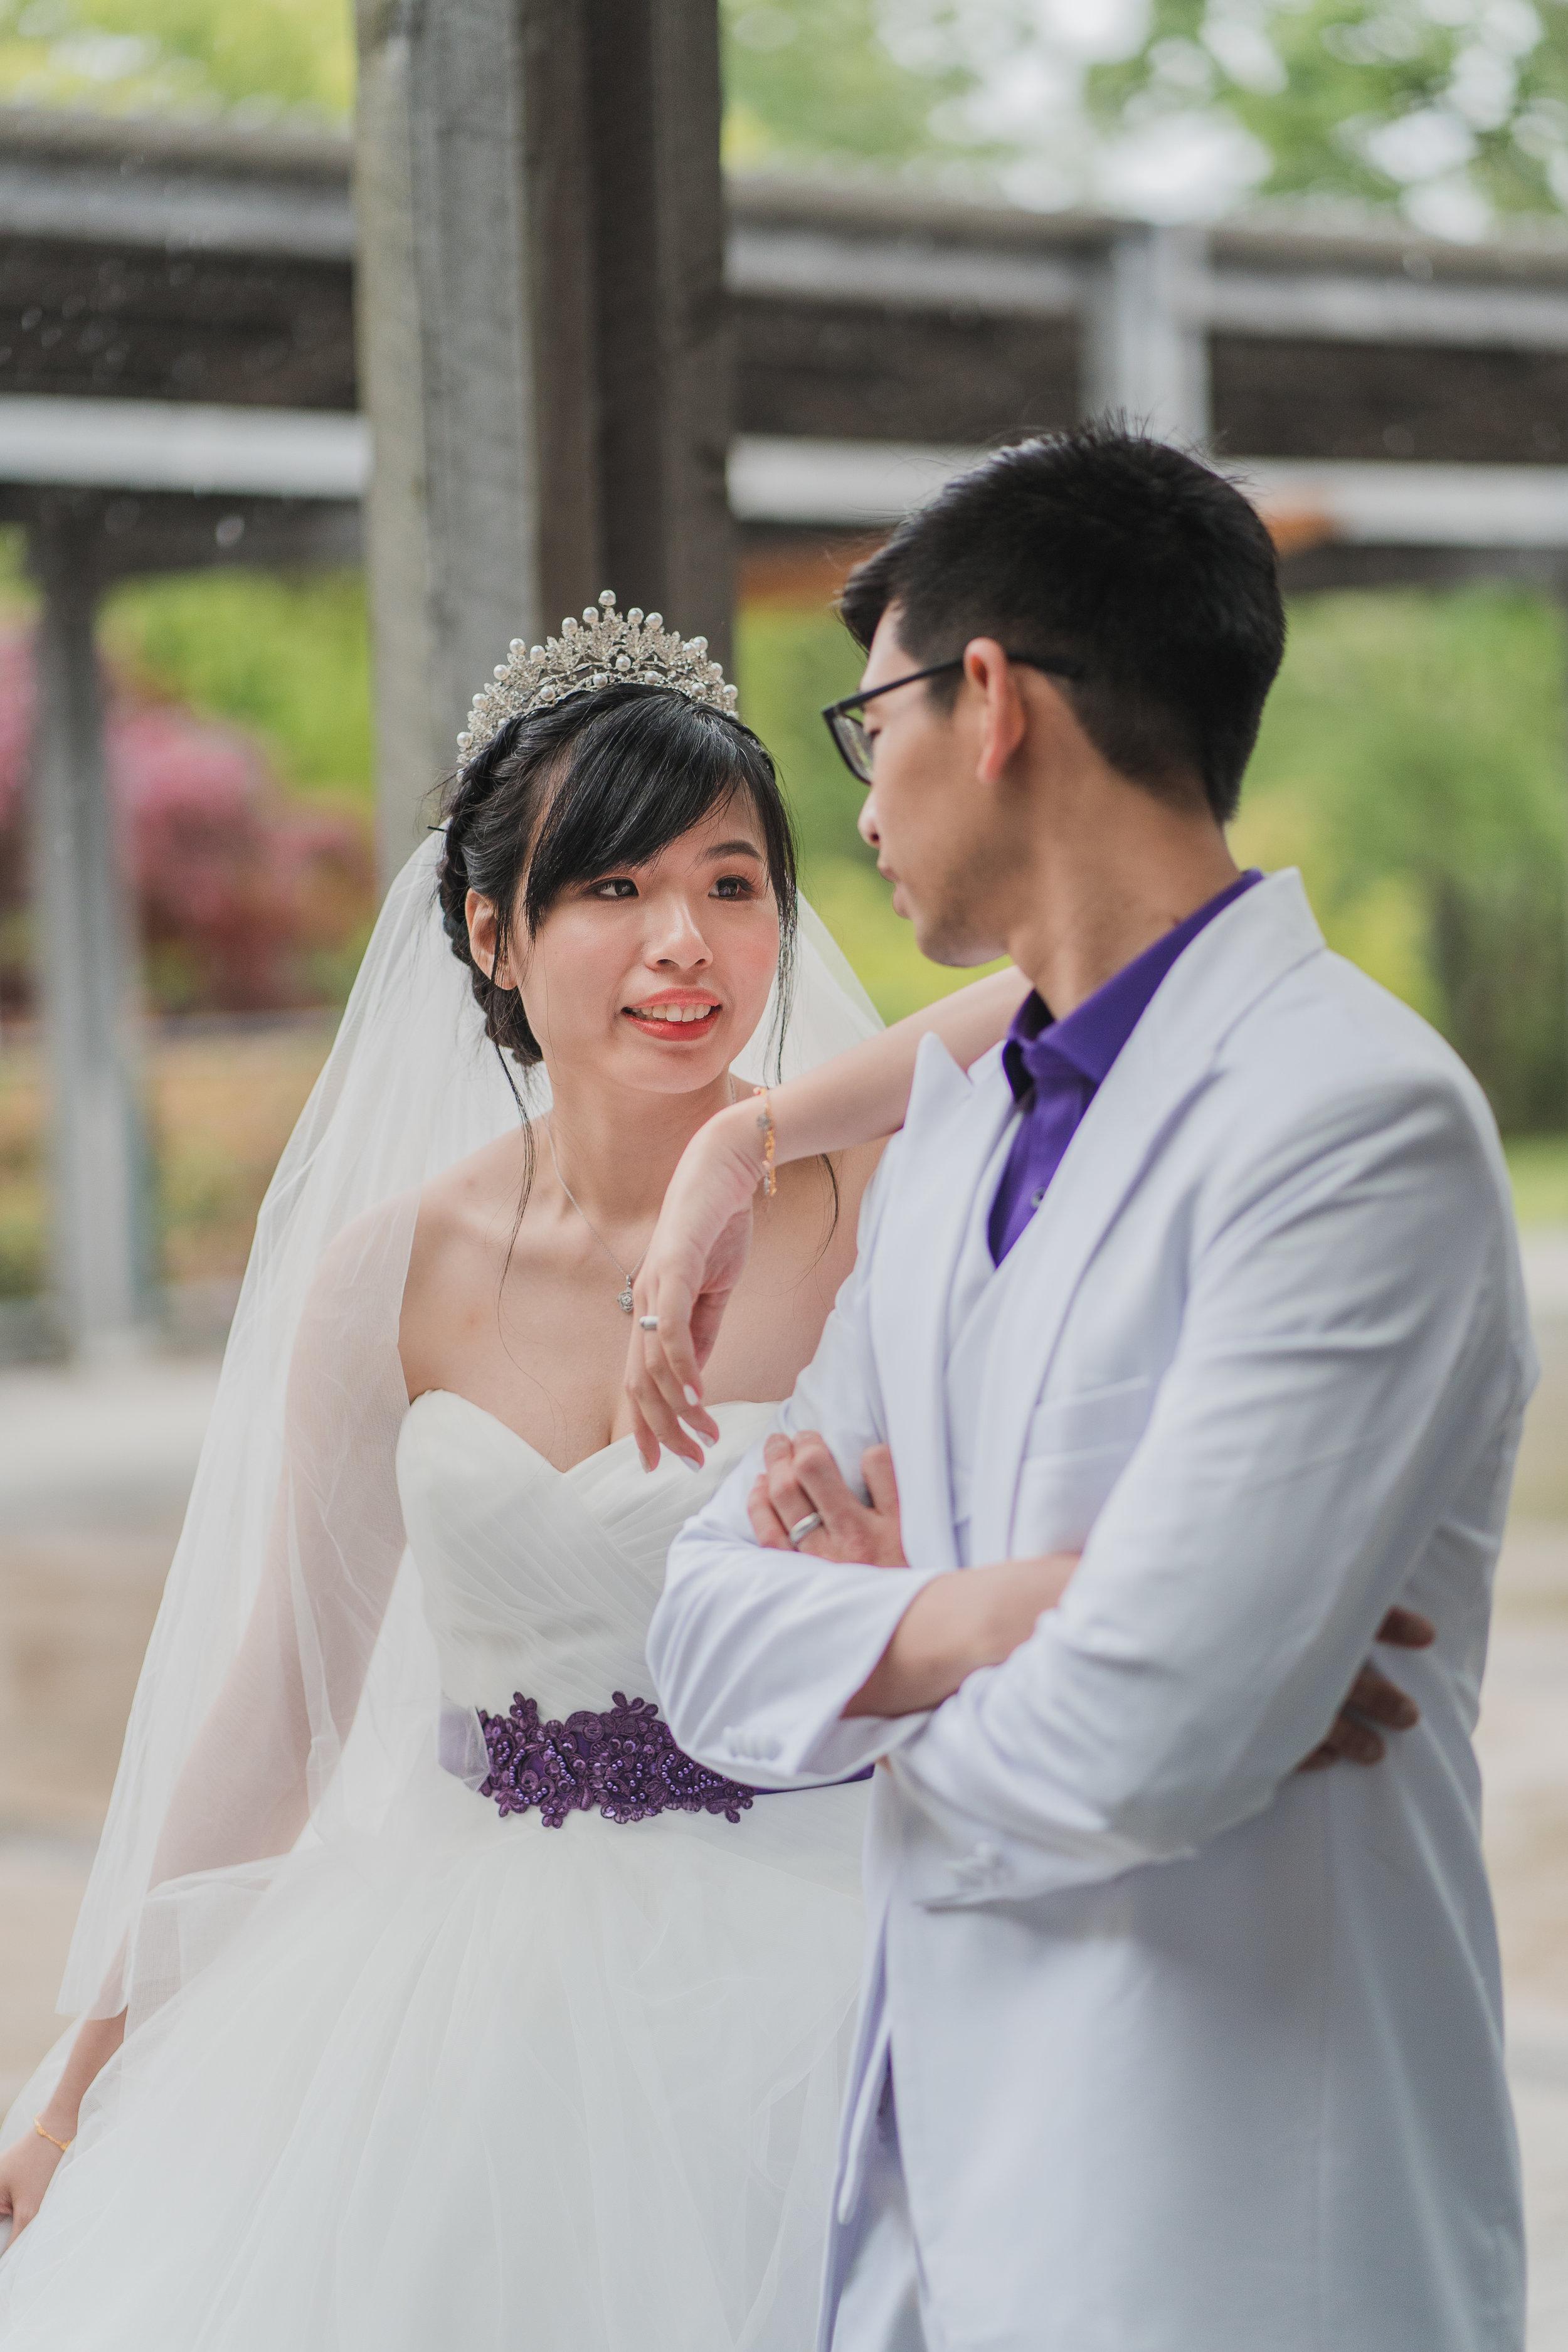 20190520 - Pamela & Matthew Wedding - 0233.jpg